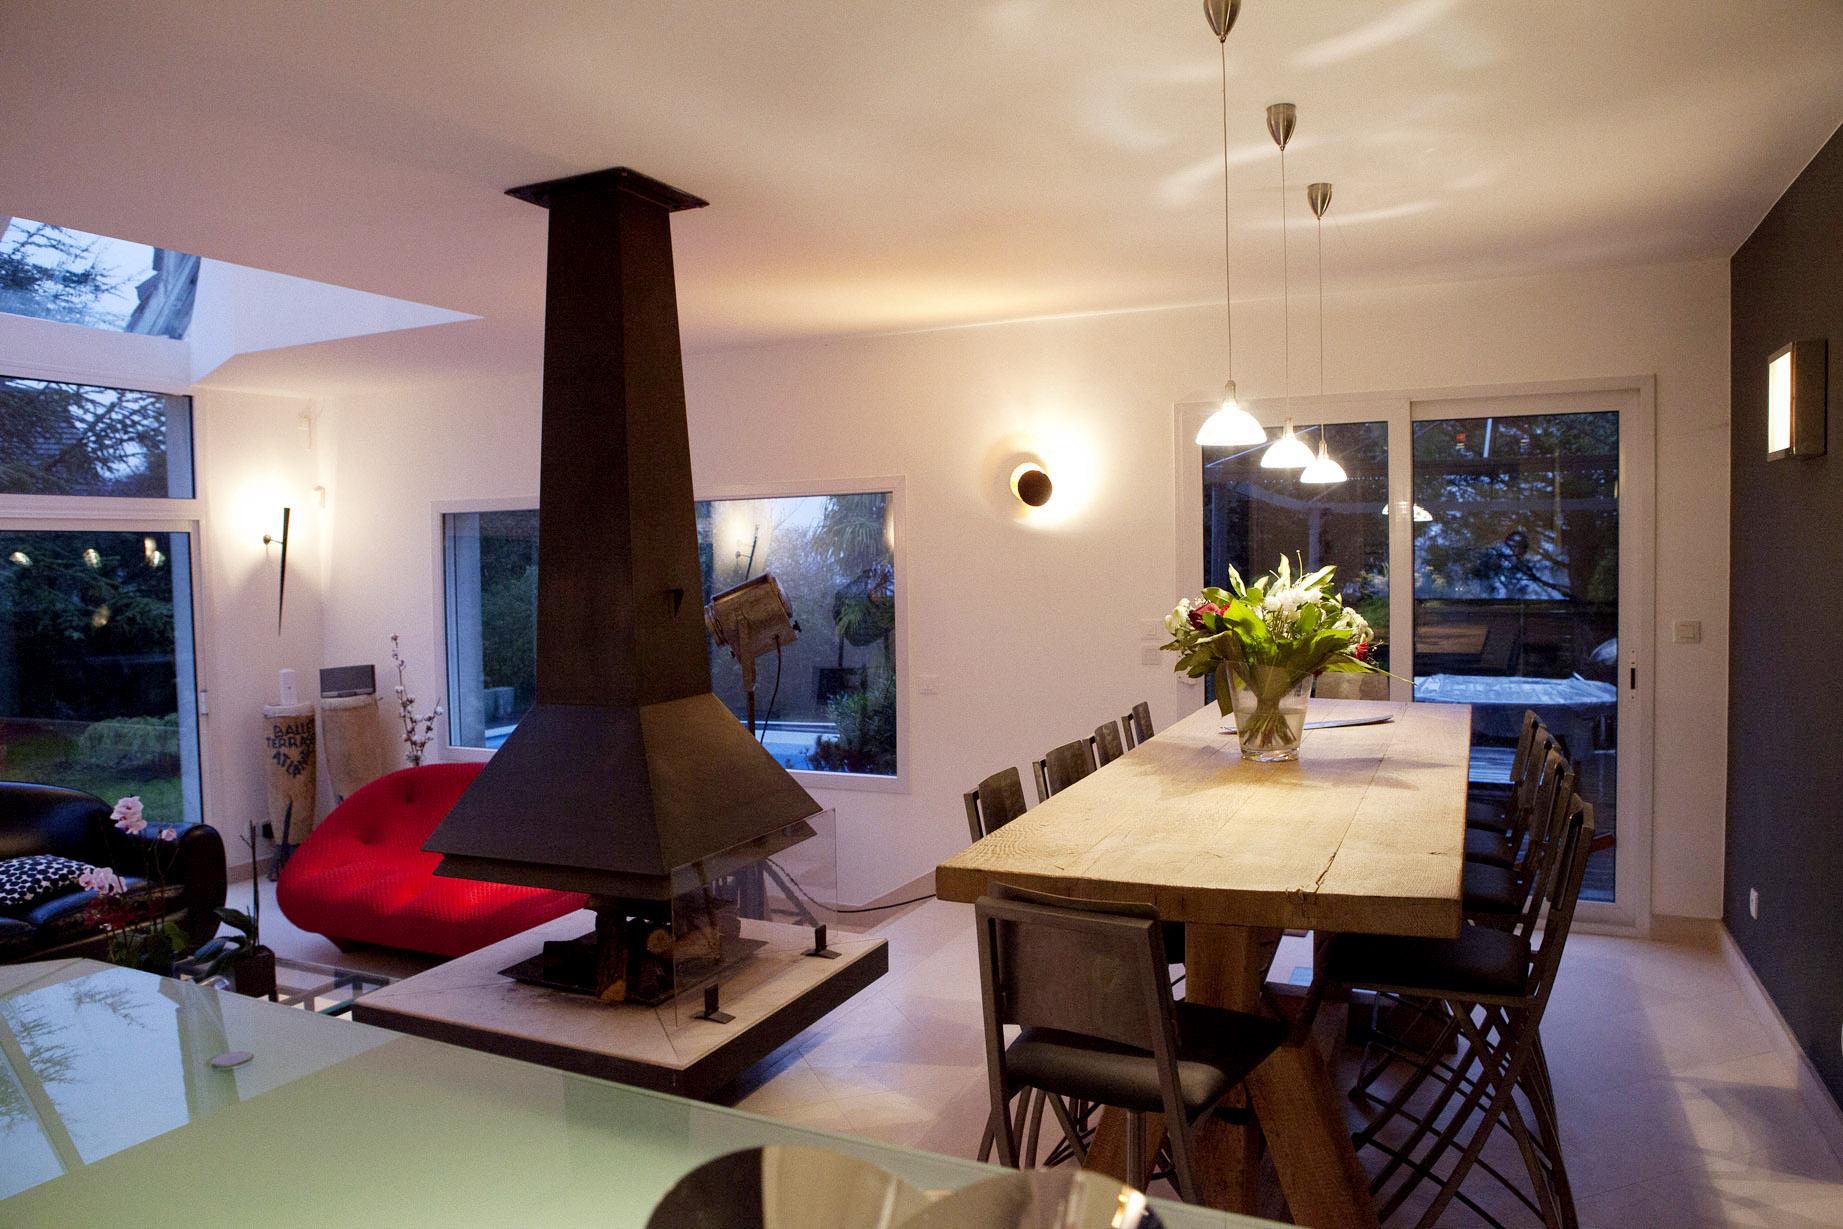 agencement d 39 int rieur aptitude design. Black Bedroom Furniture Sets. Home Design Ideas